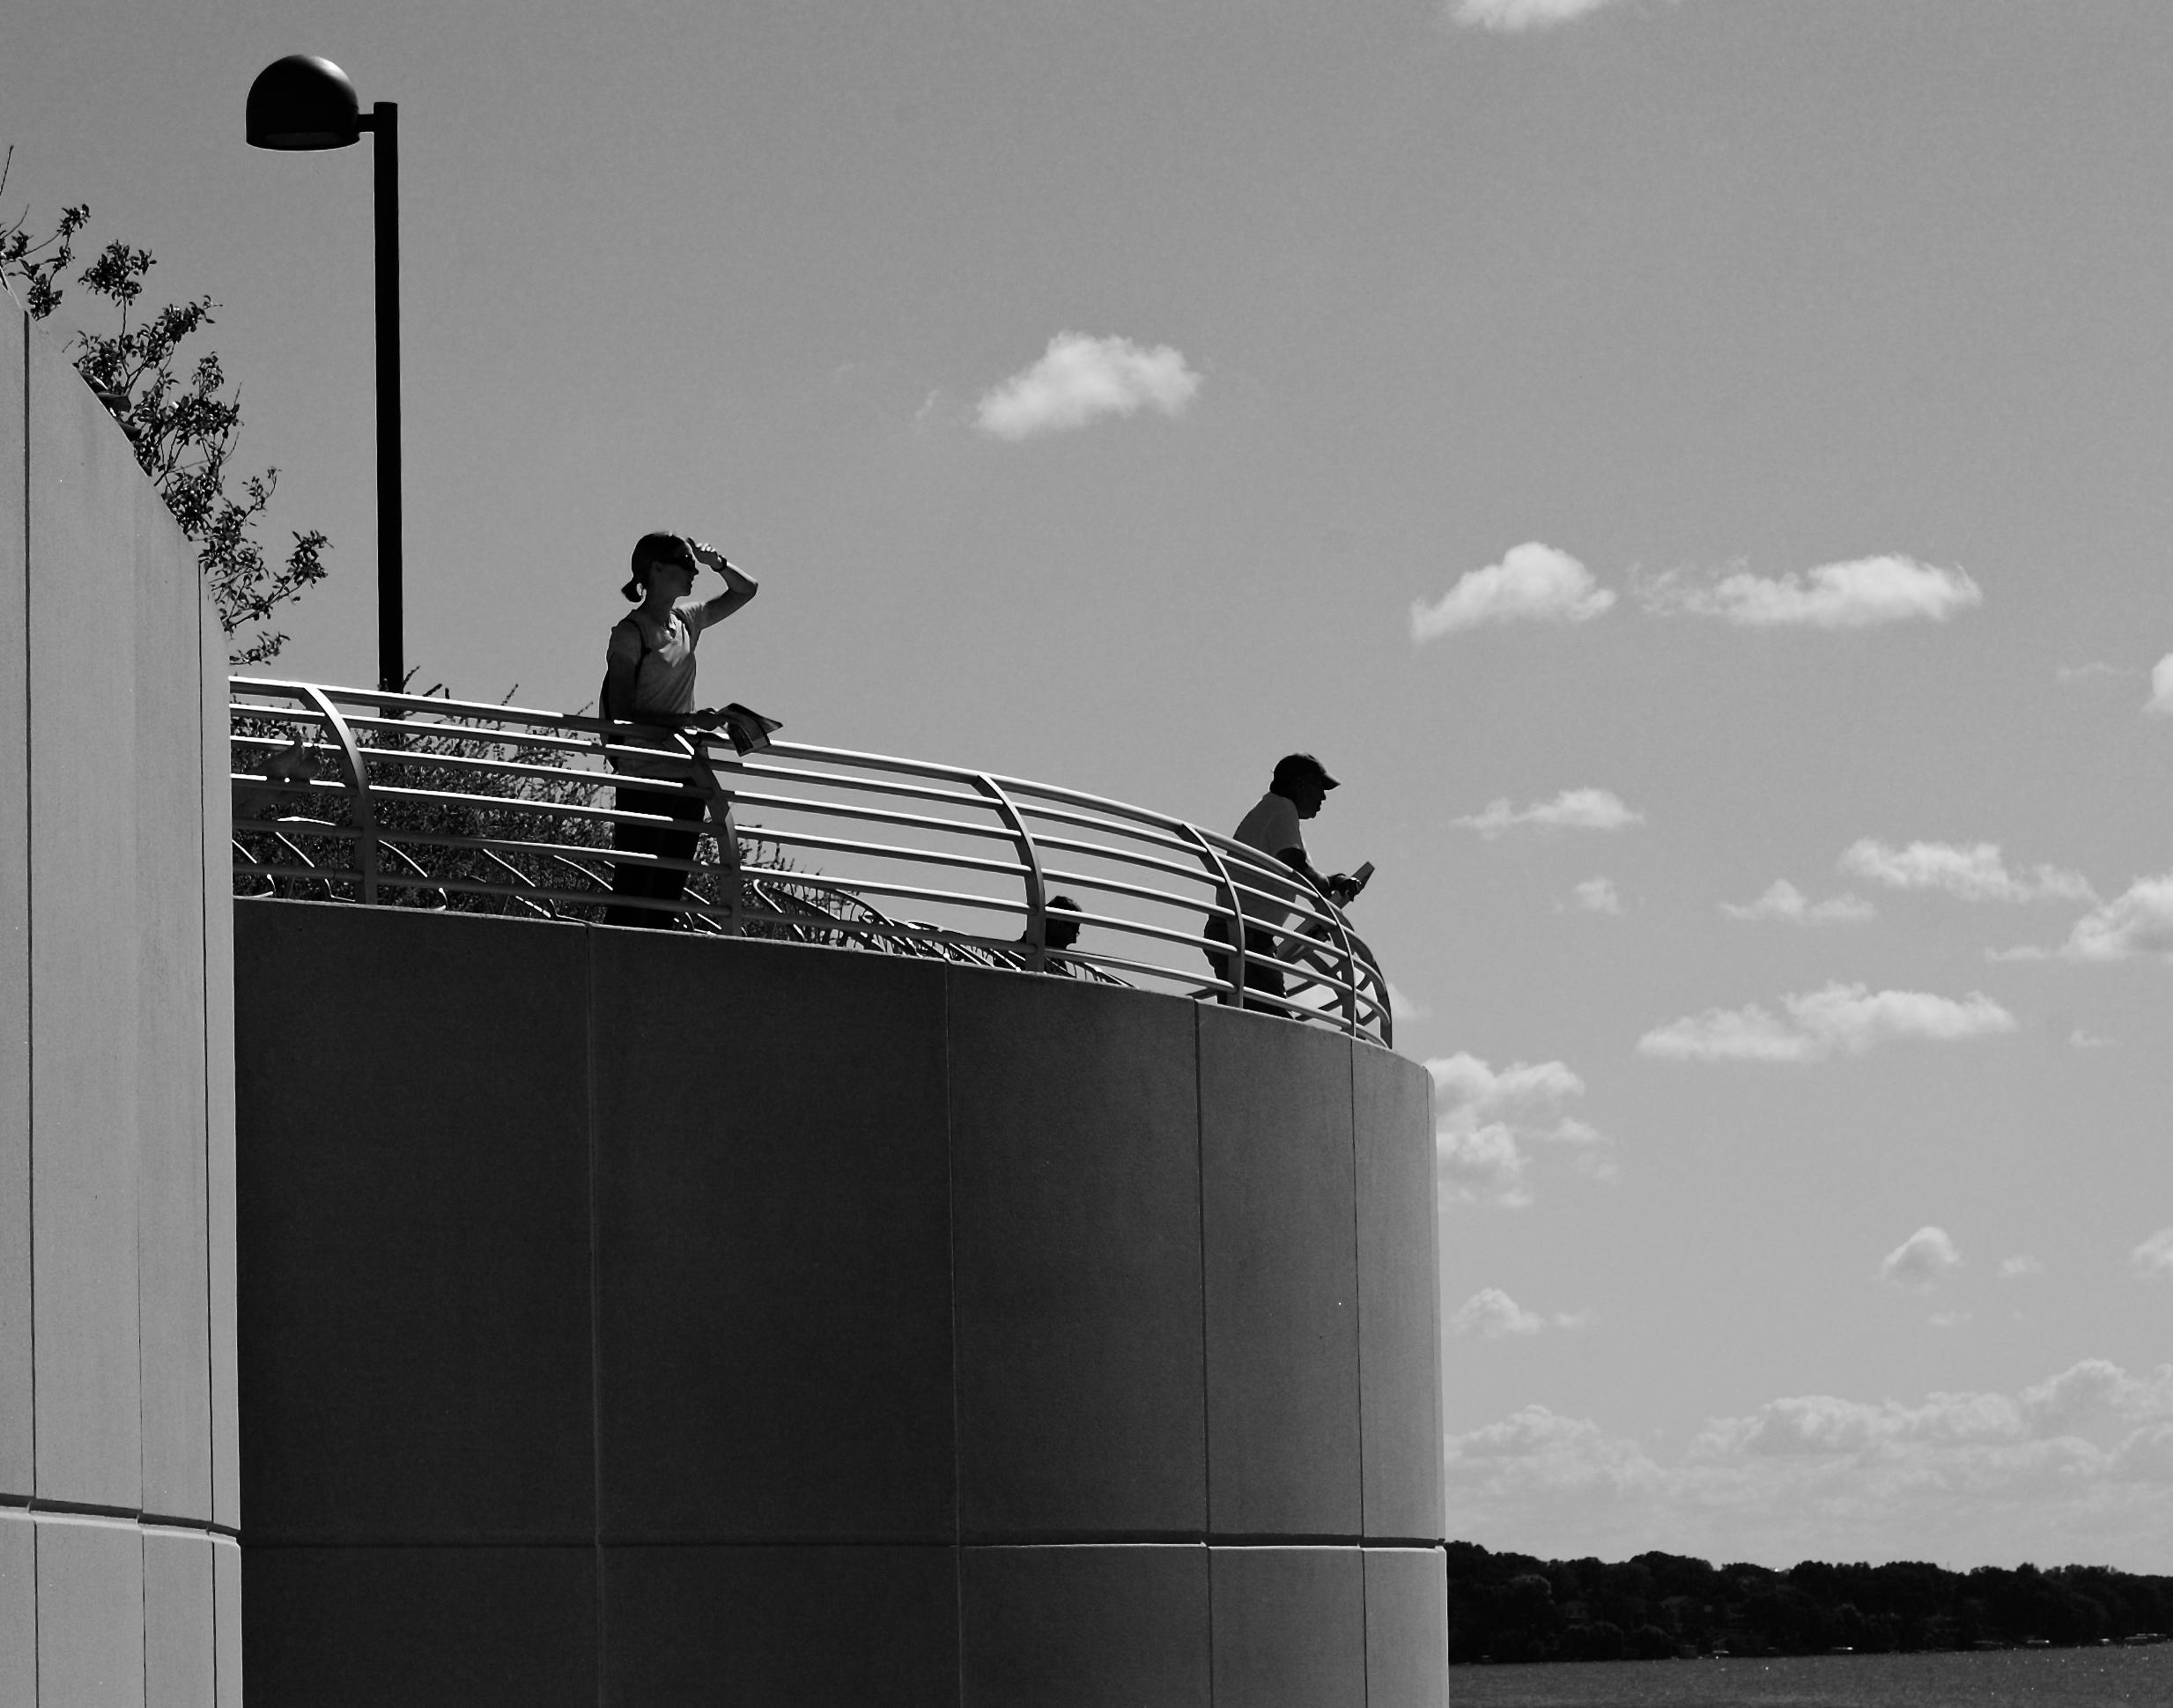 Monona Terrace.Madison, Wisconsin. September, 2015. WDW-2015-09-13-12-17-03